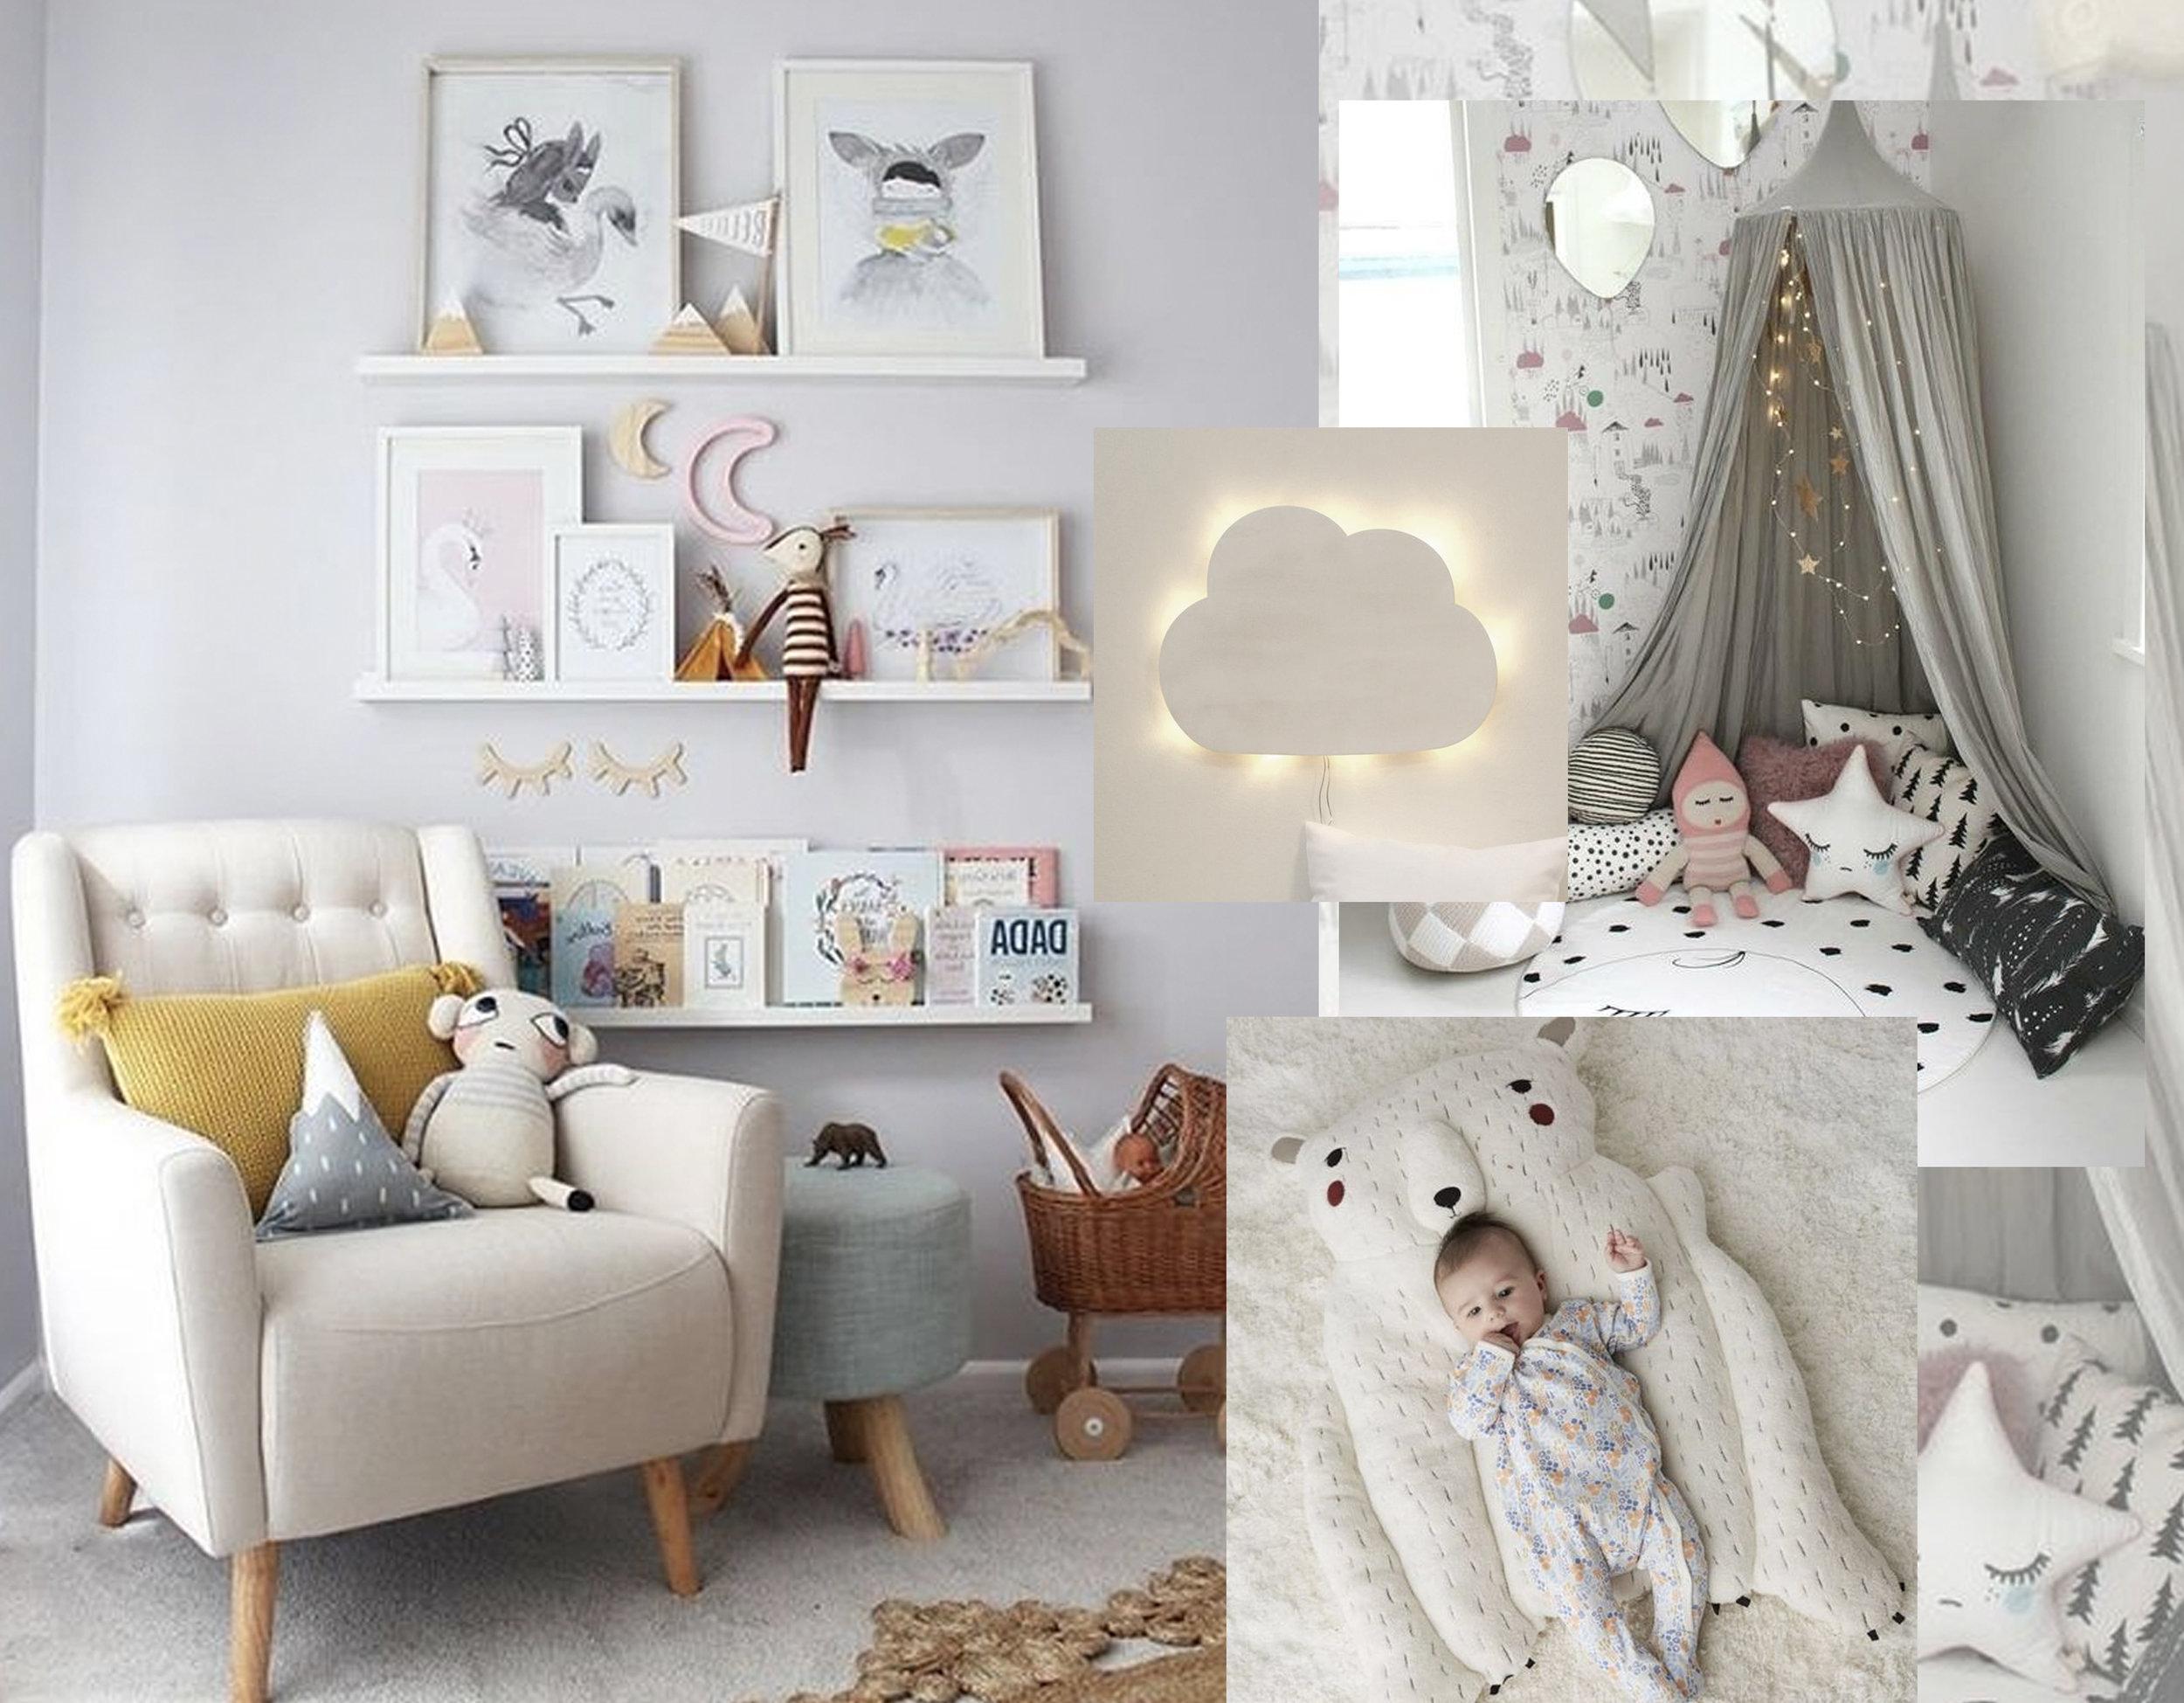 reading corner nursery via  Instagram  - tent via  Pinimg  - cloud lamp via  Dawanda  - Polar Bear  Crate & Barrel